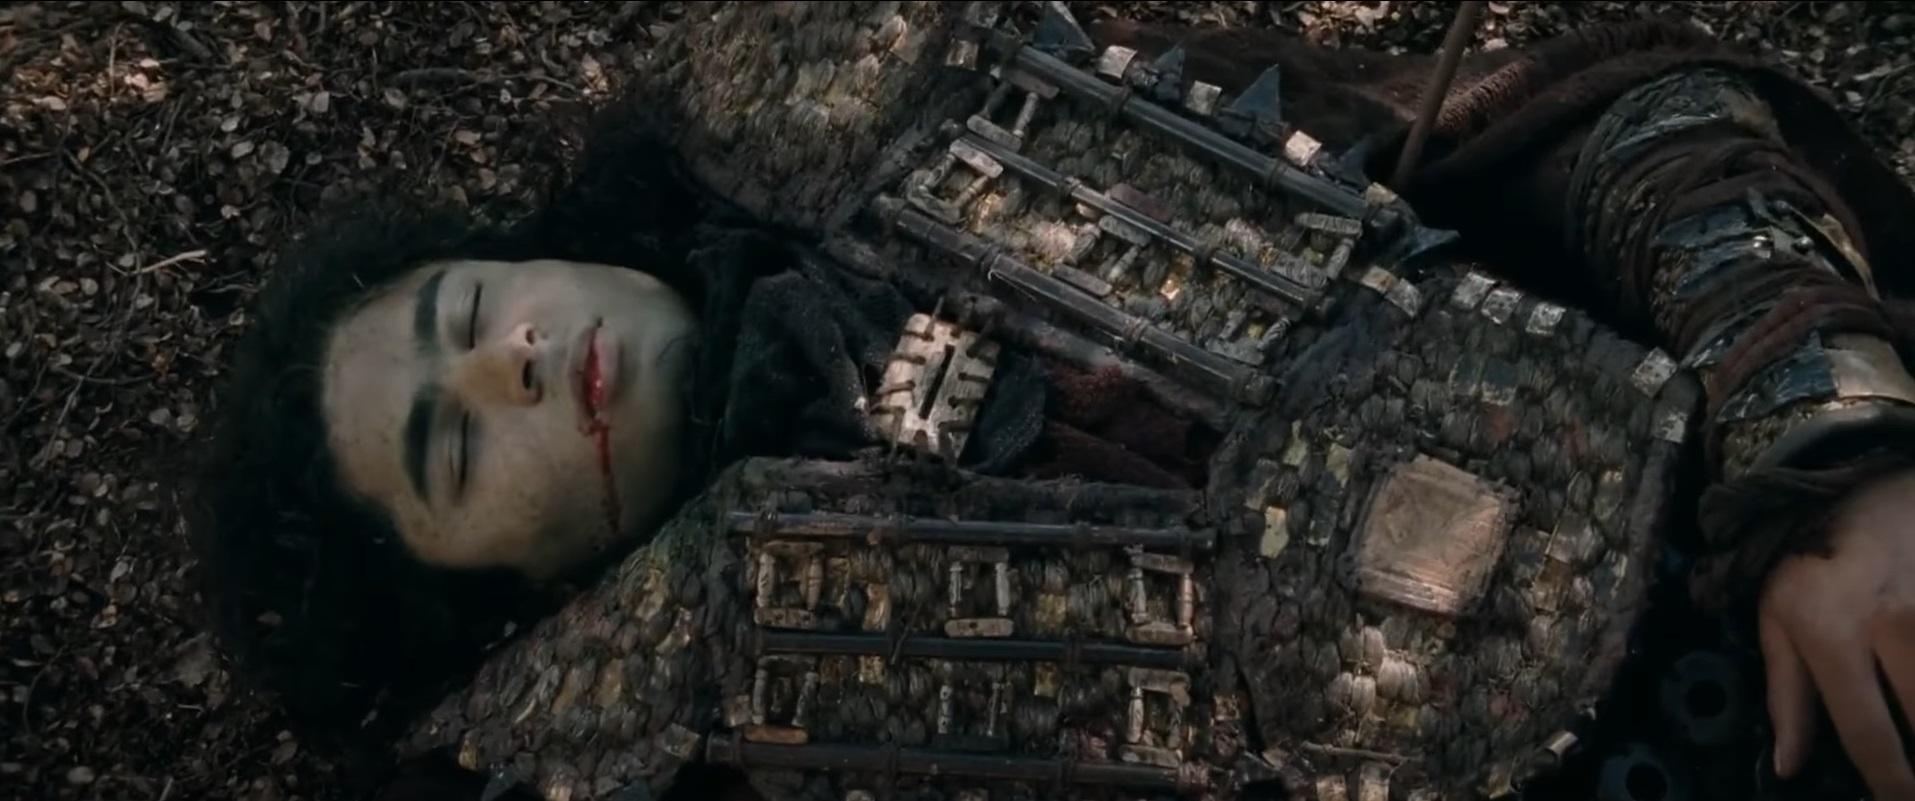 File:A Dead Easterling, Servant of Sauron.JPG